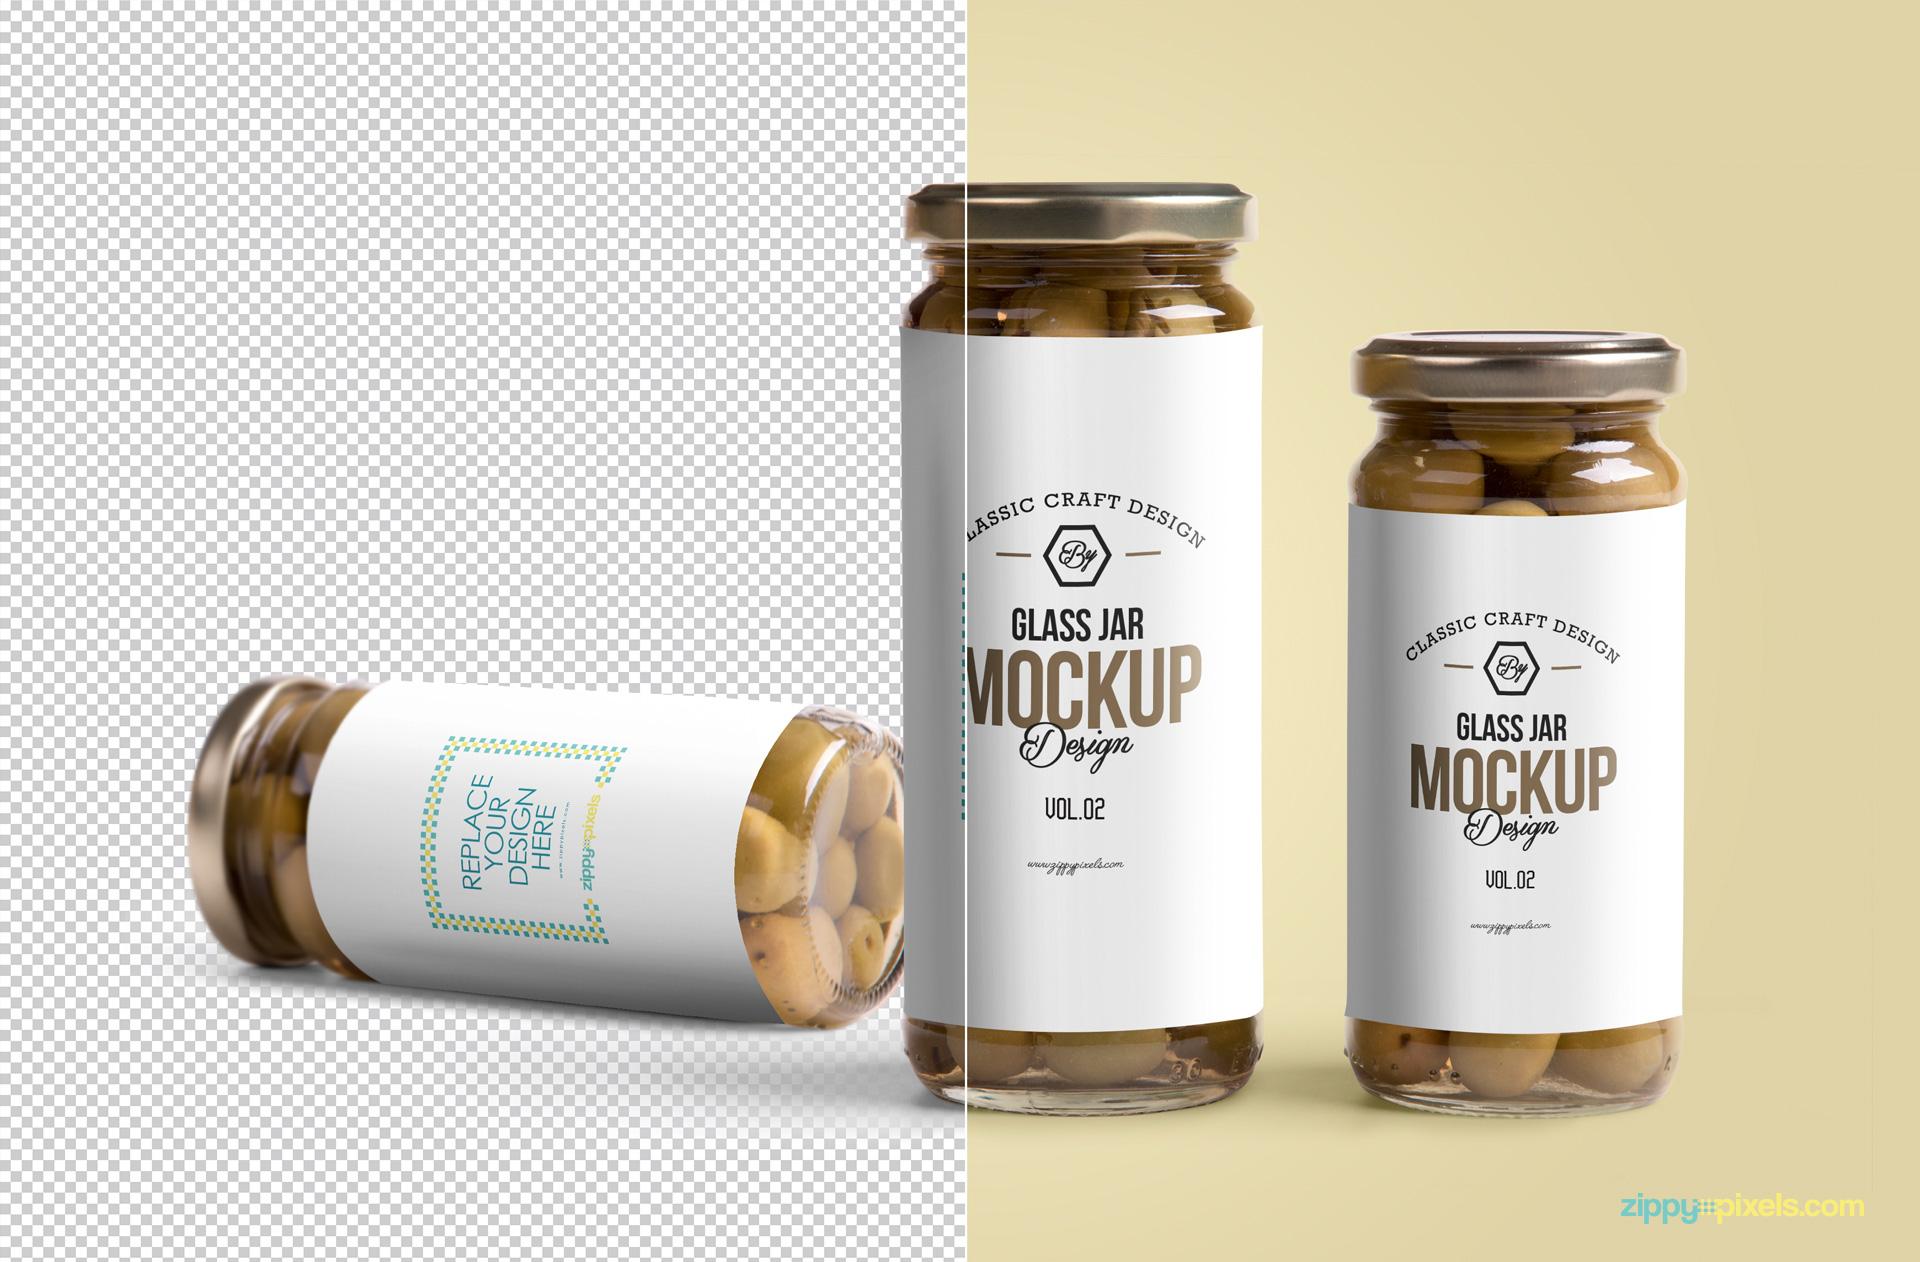 free high-resolution glass jar mockup